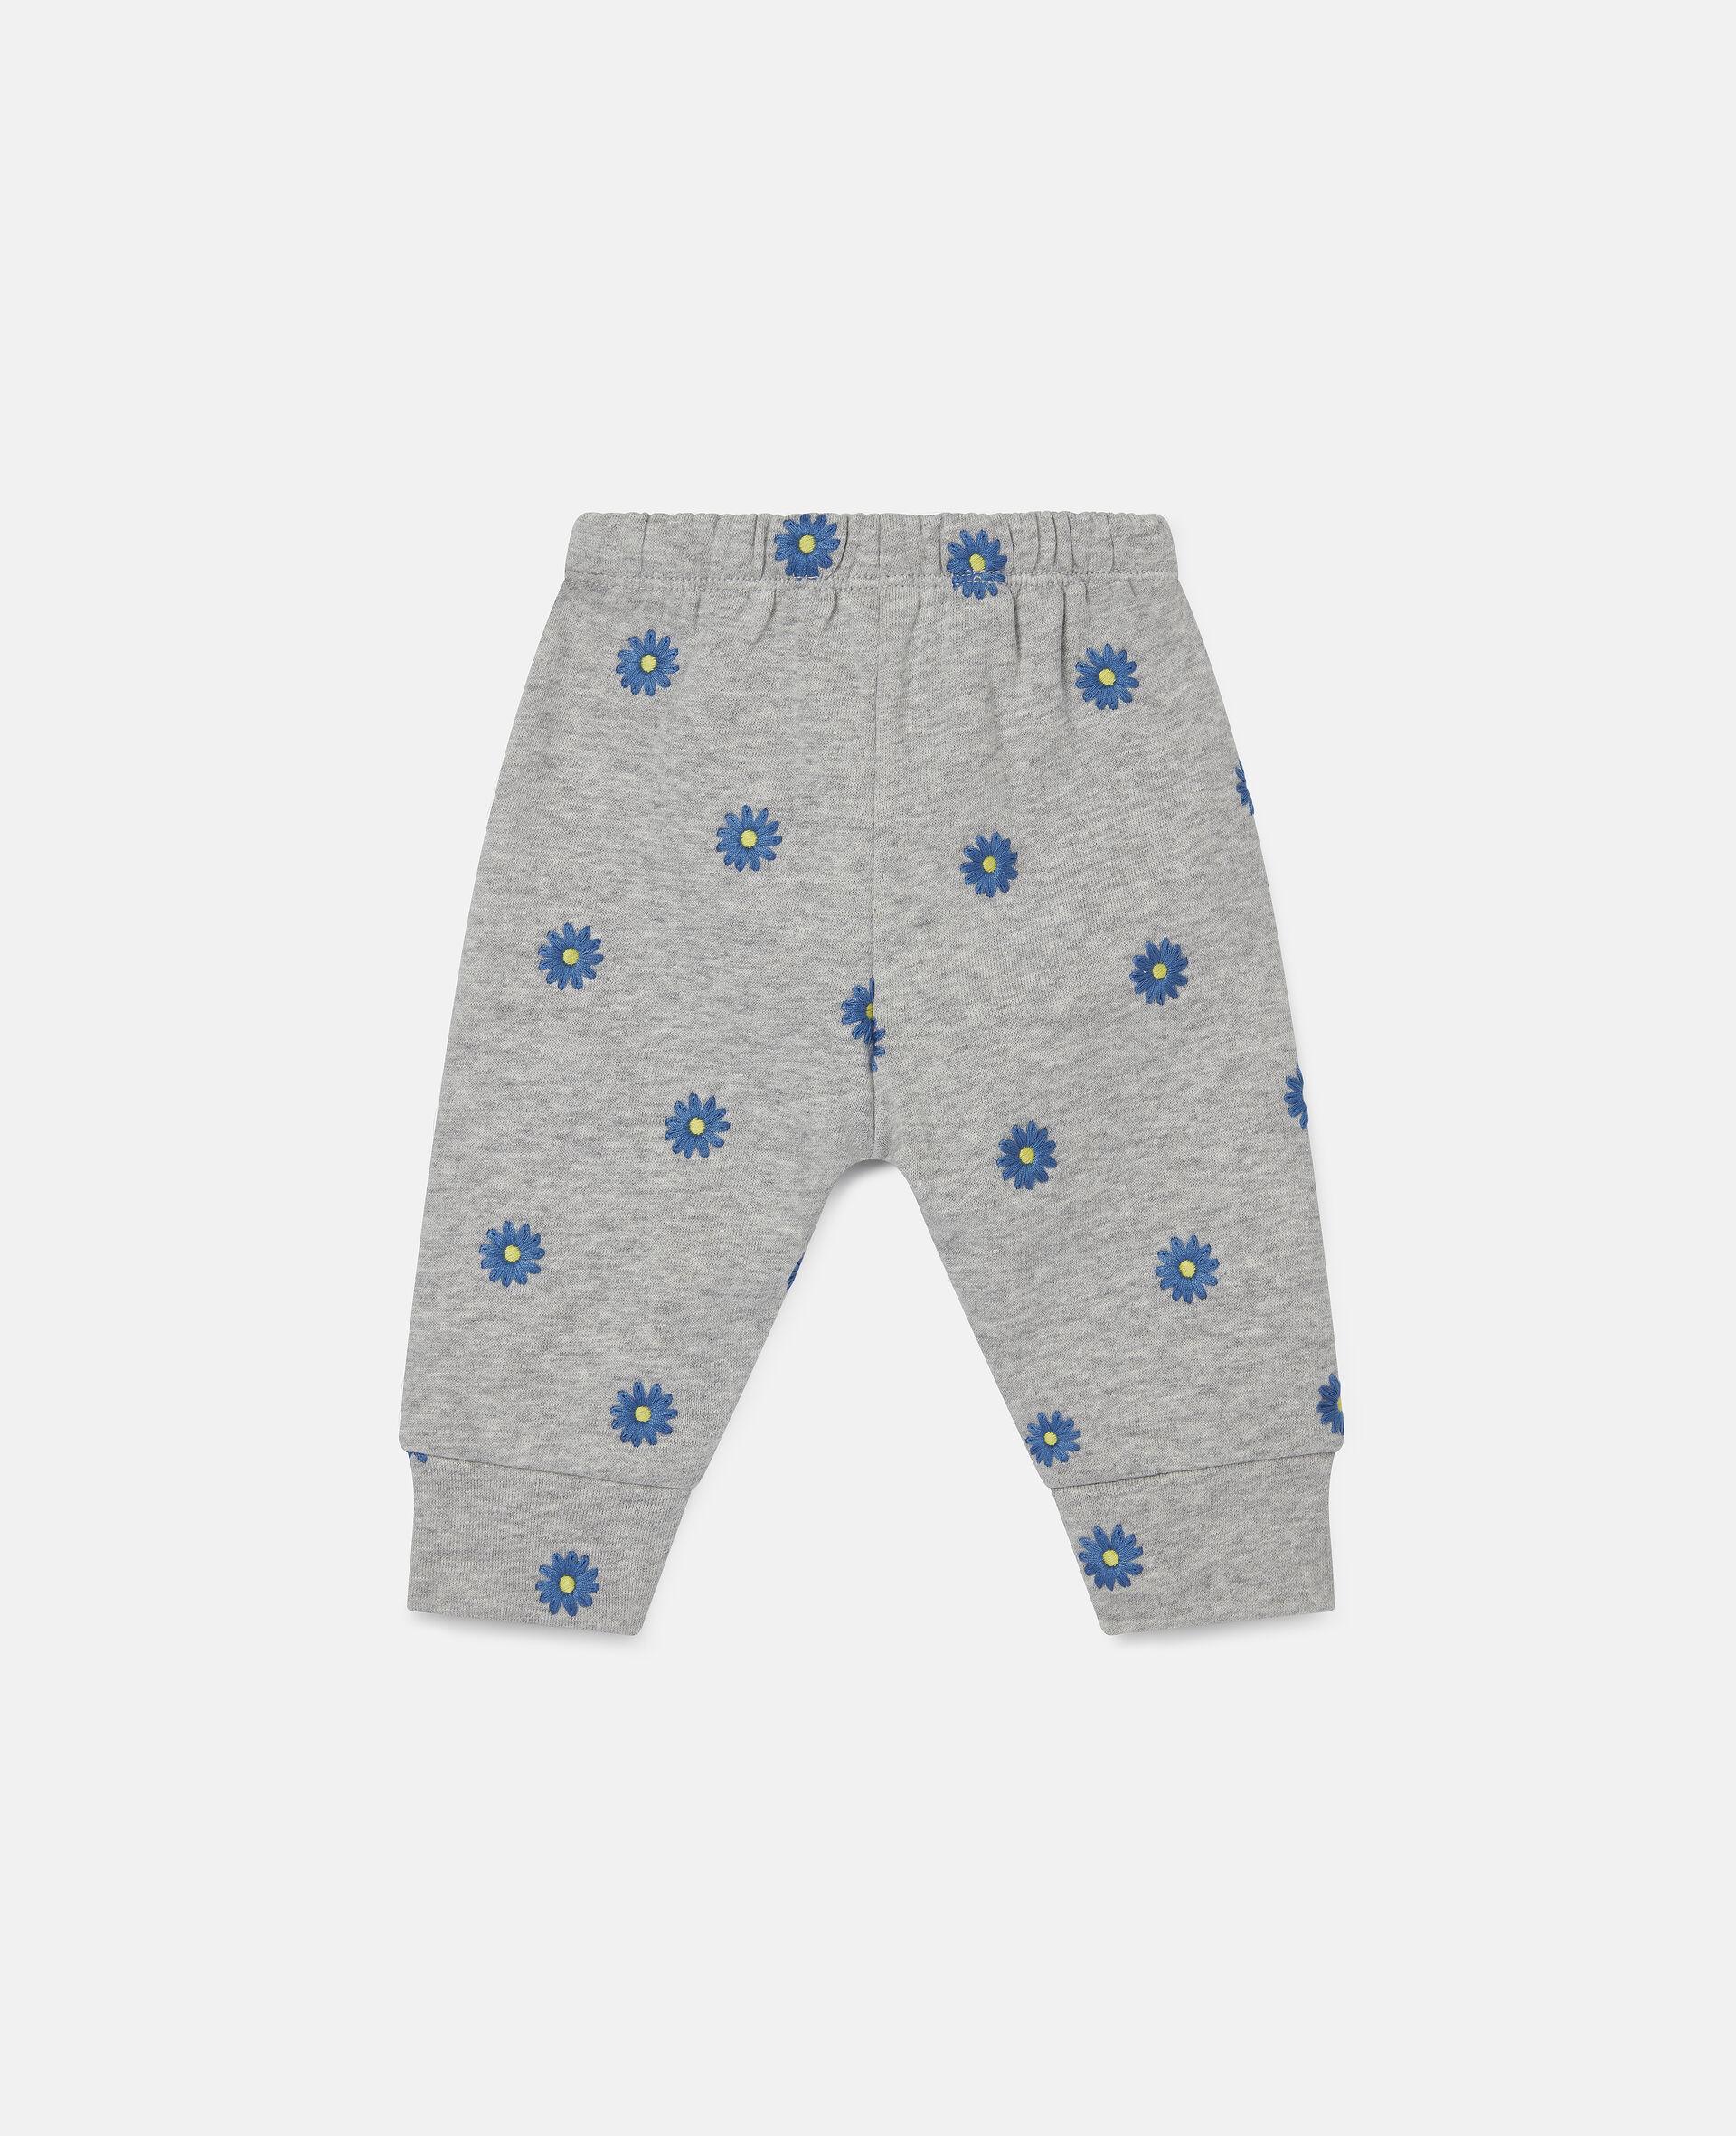 Pantaloni in Felpa di Cotone con Margherite Ricamate-Grigio-large image number 3